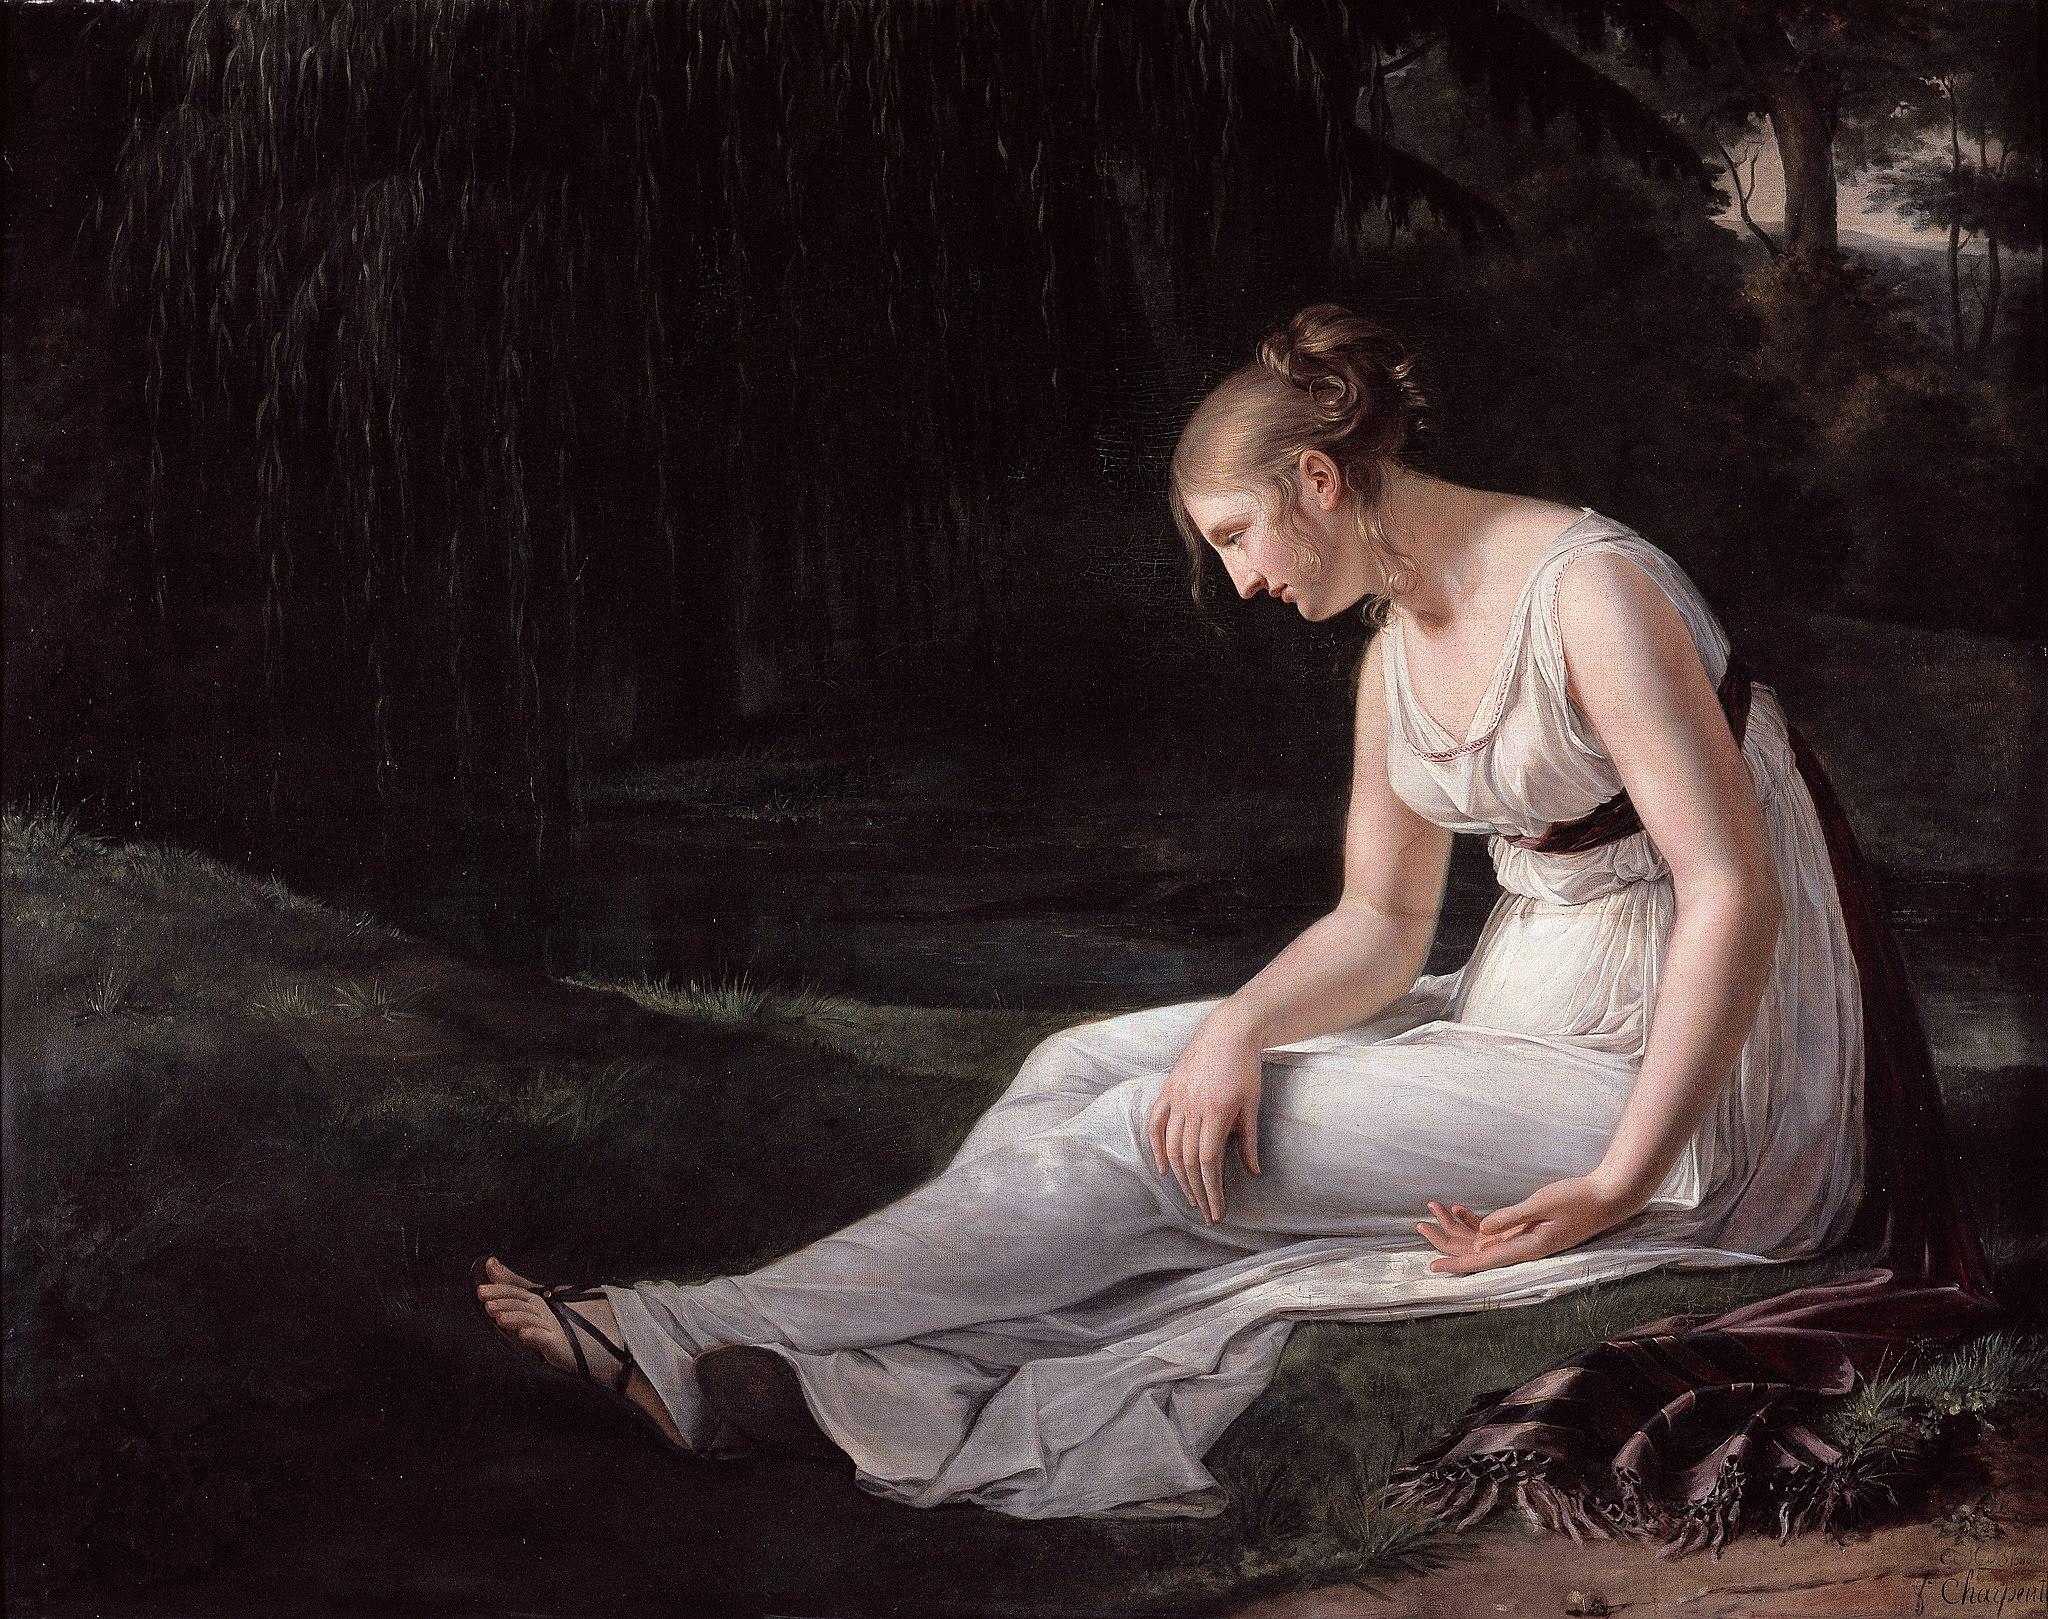 2048px Charpentier Constance Marie Melancholy 1801